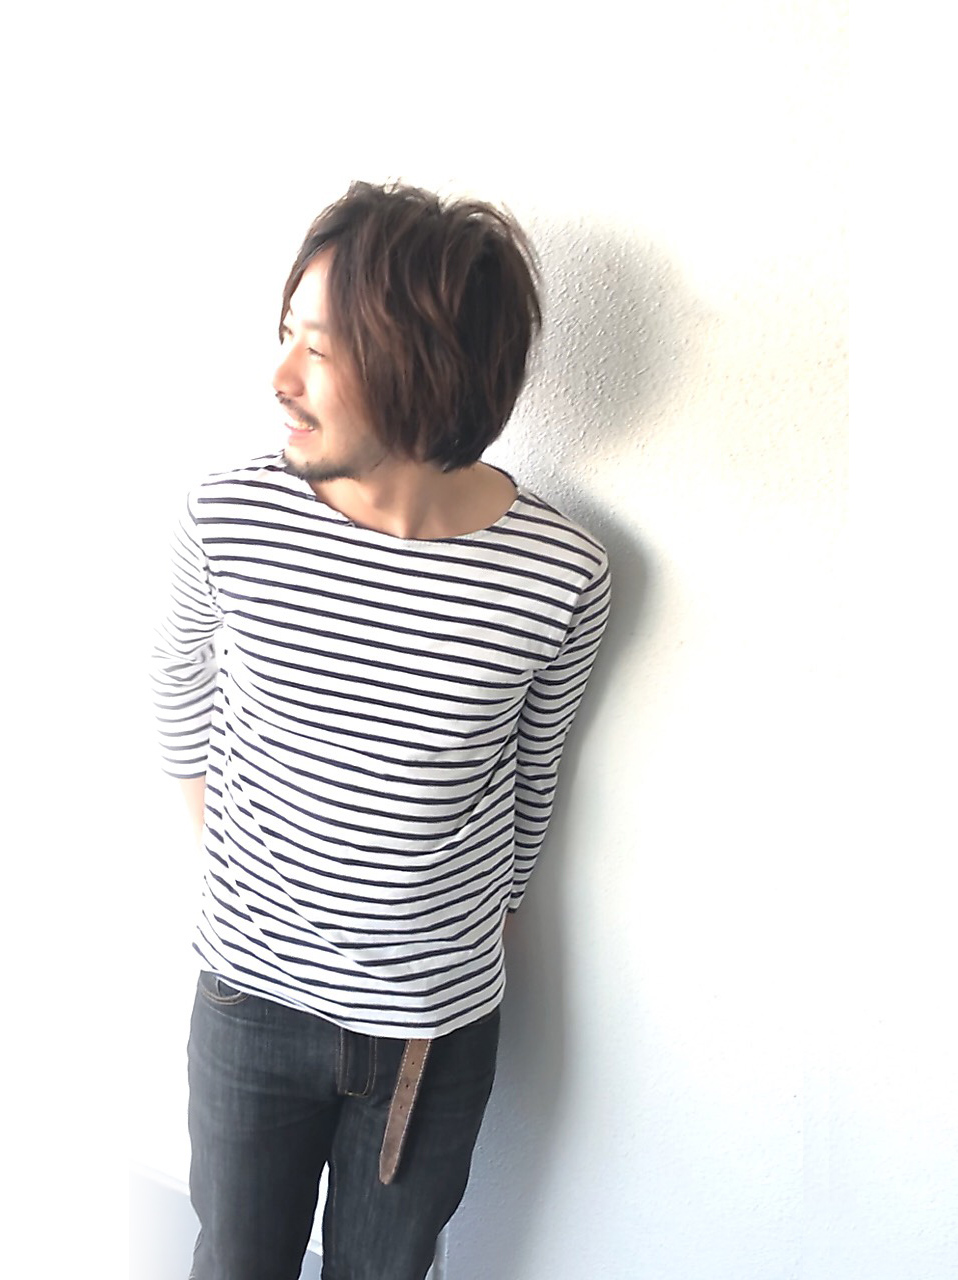 RinoShores SHONAN 辻堂店|YOKOHAMA. 日本大通り店|スタッフ